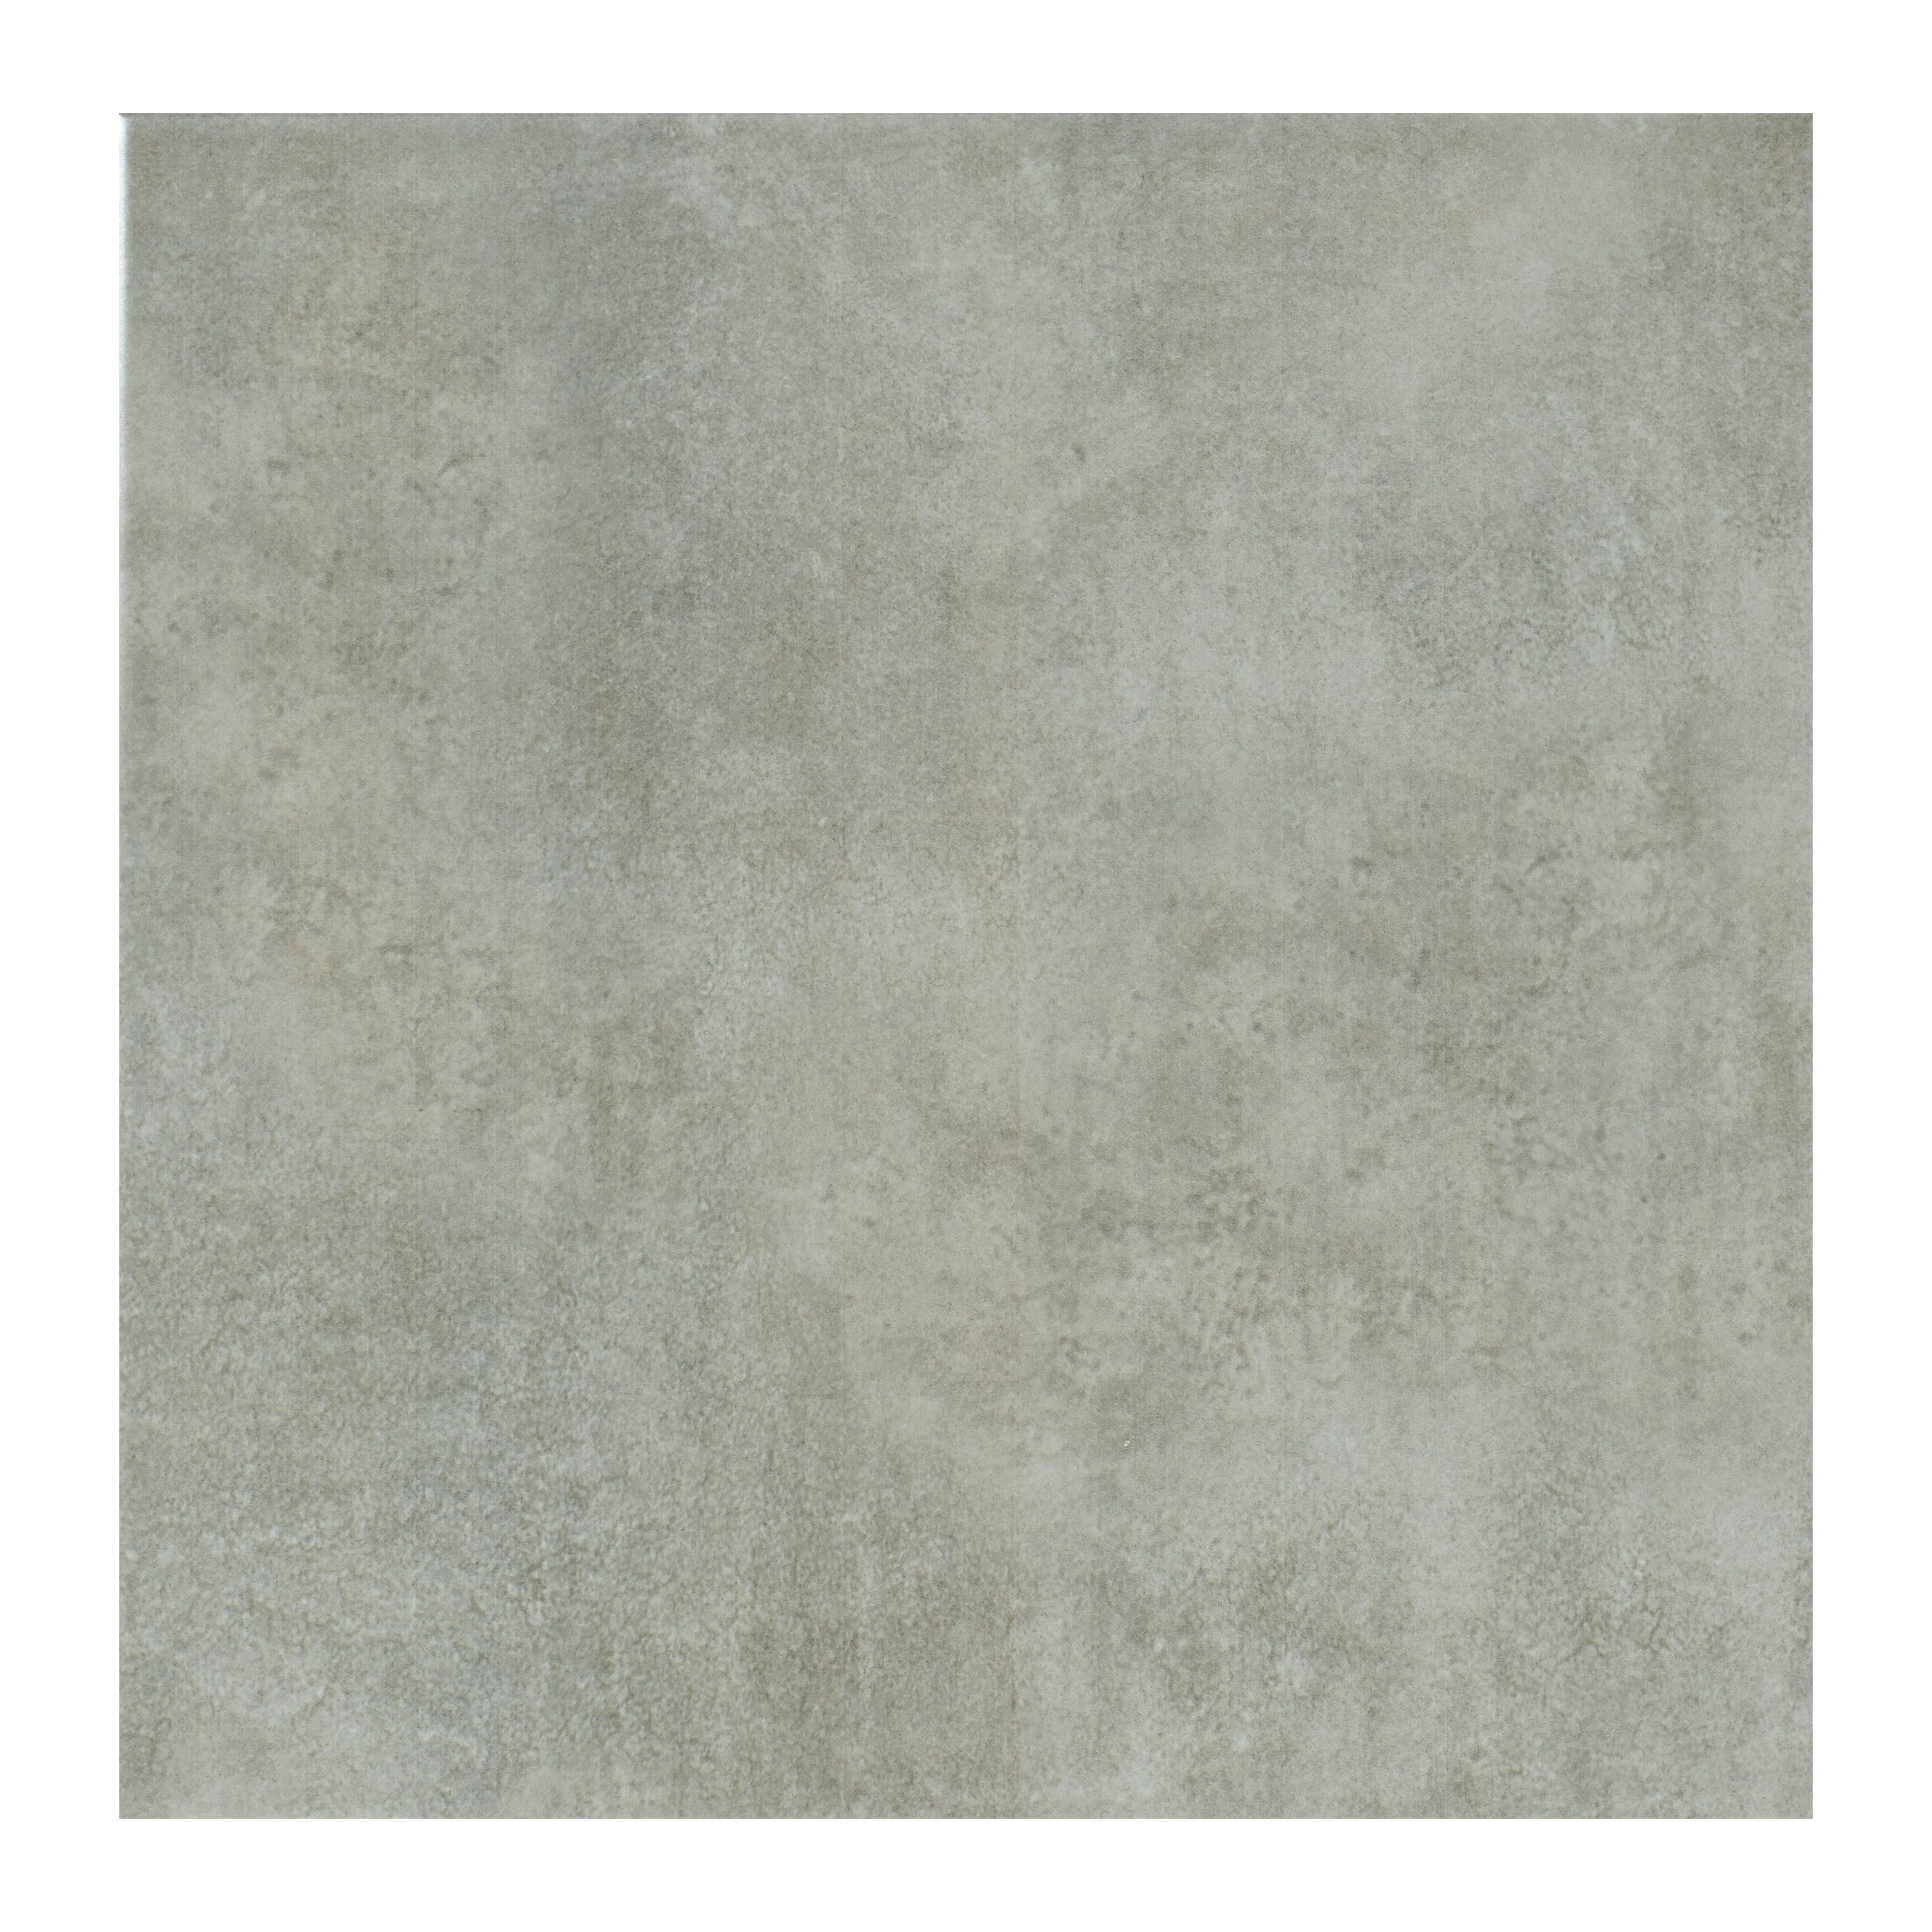 Lombardy platinum ceramic floor tile pack of 9 l330mm w330mm ceramic floor tiles dailygadgetfo Choice Image